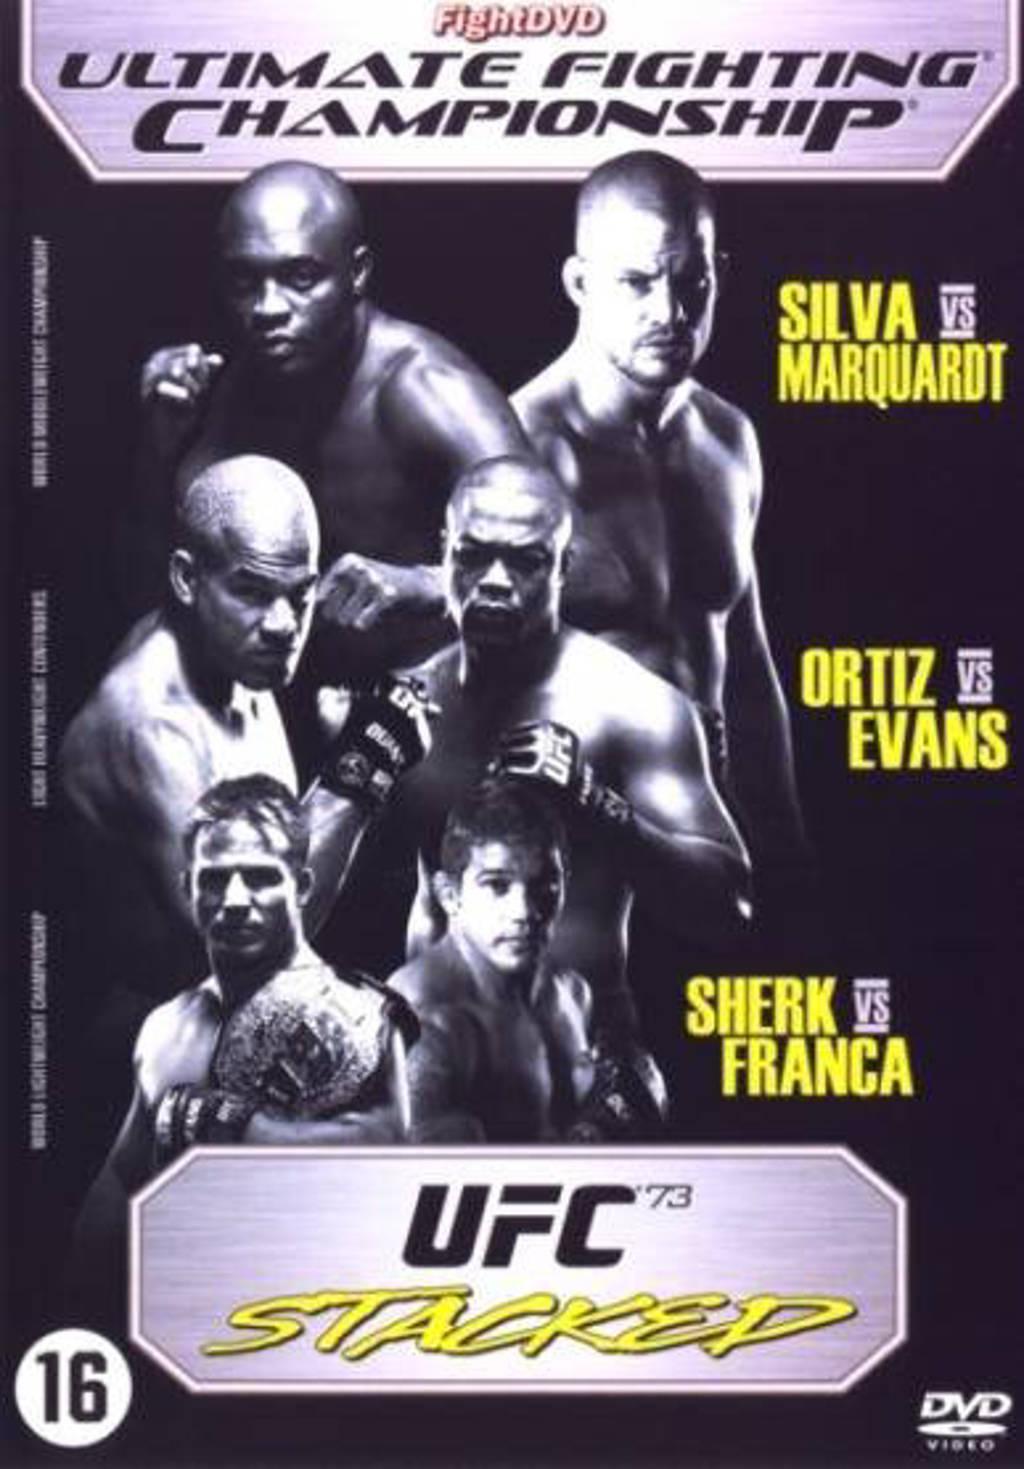 UFC - UFC 73 stacked (DVD)